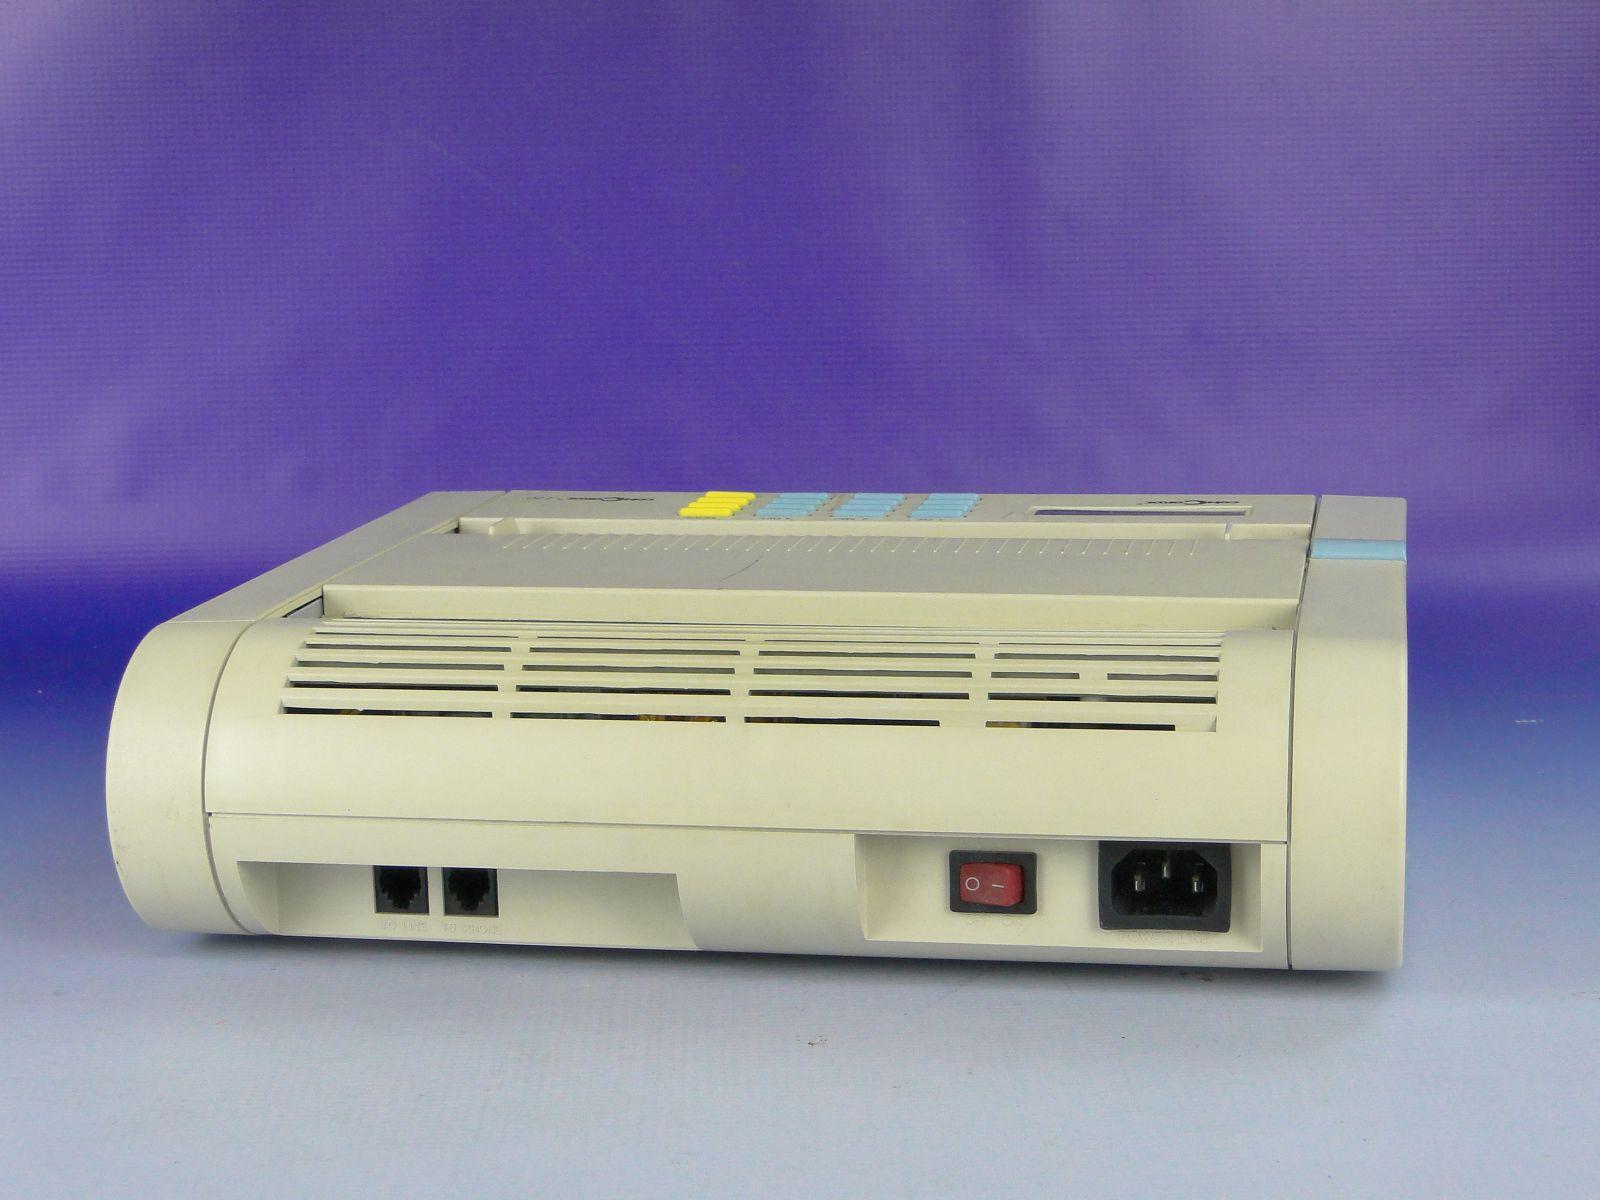 DSC09913.JPG (1600×1200)